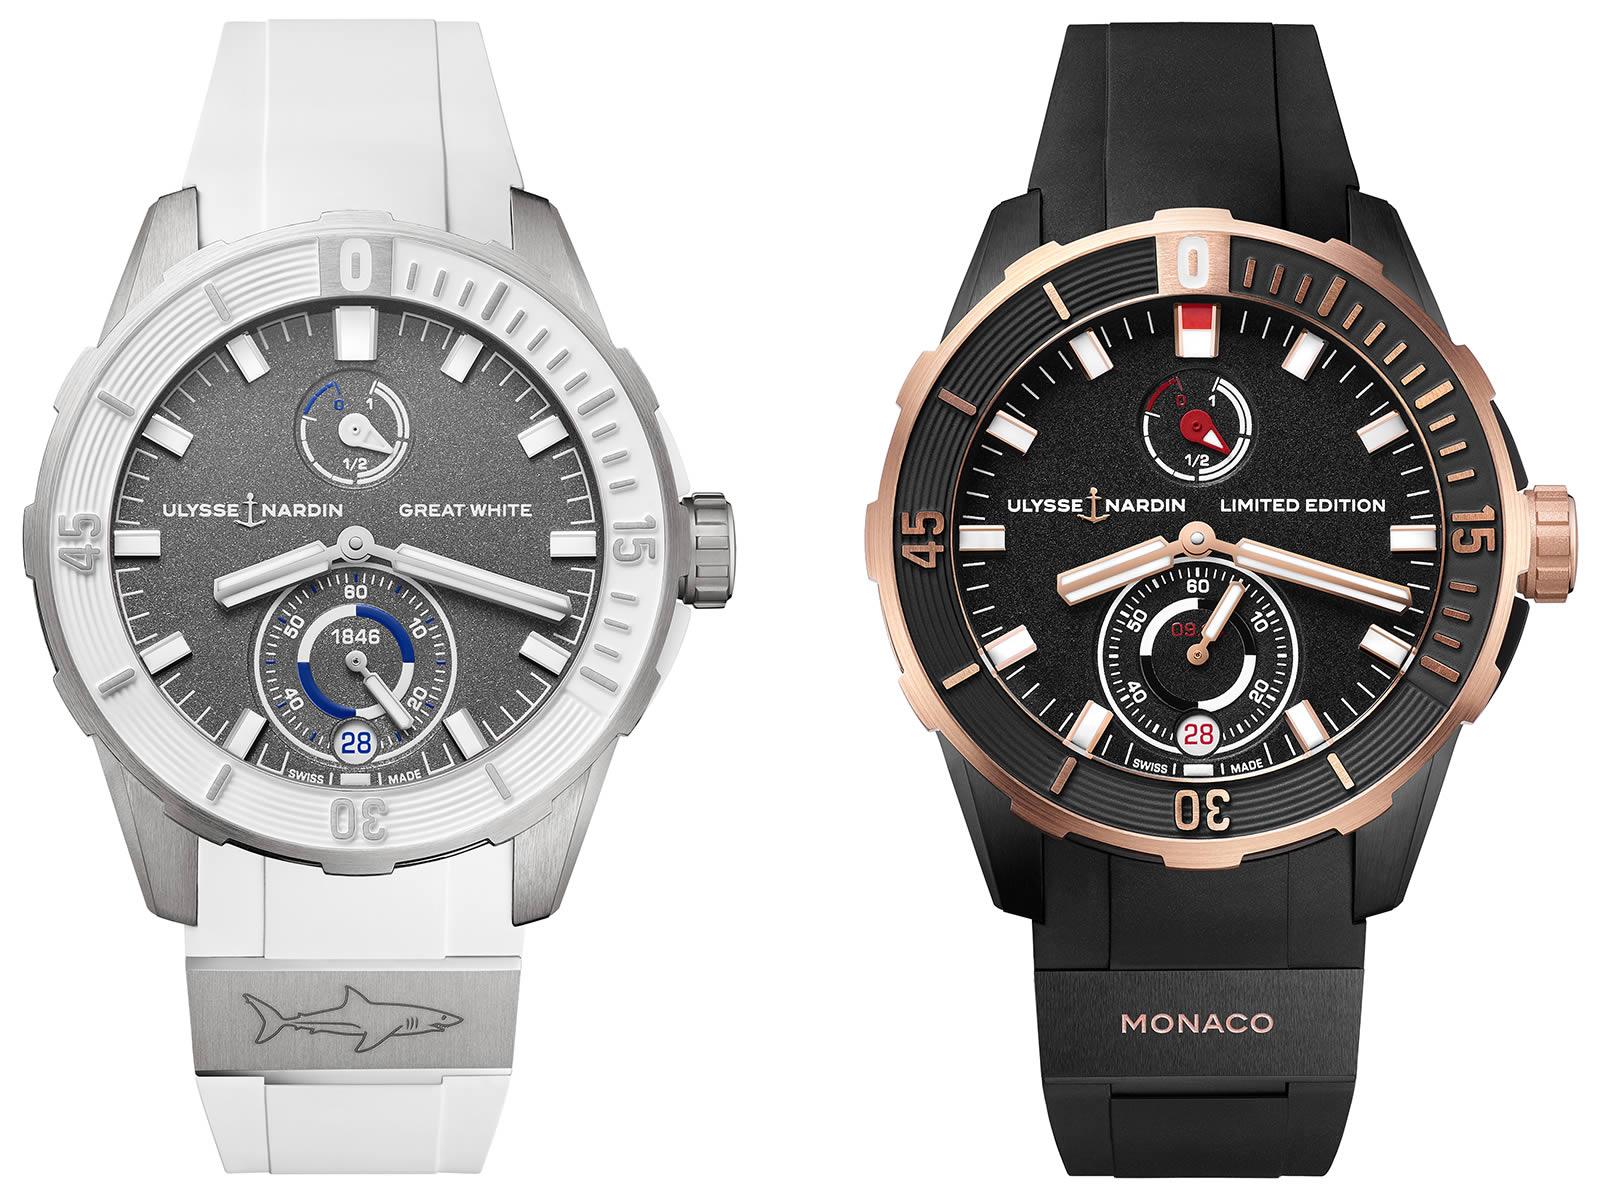 ulysse-nardin-diver-chronometer-2018-models-16-.jpg